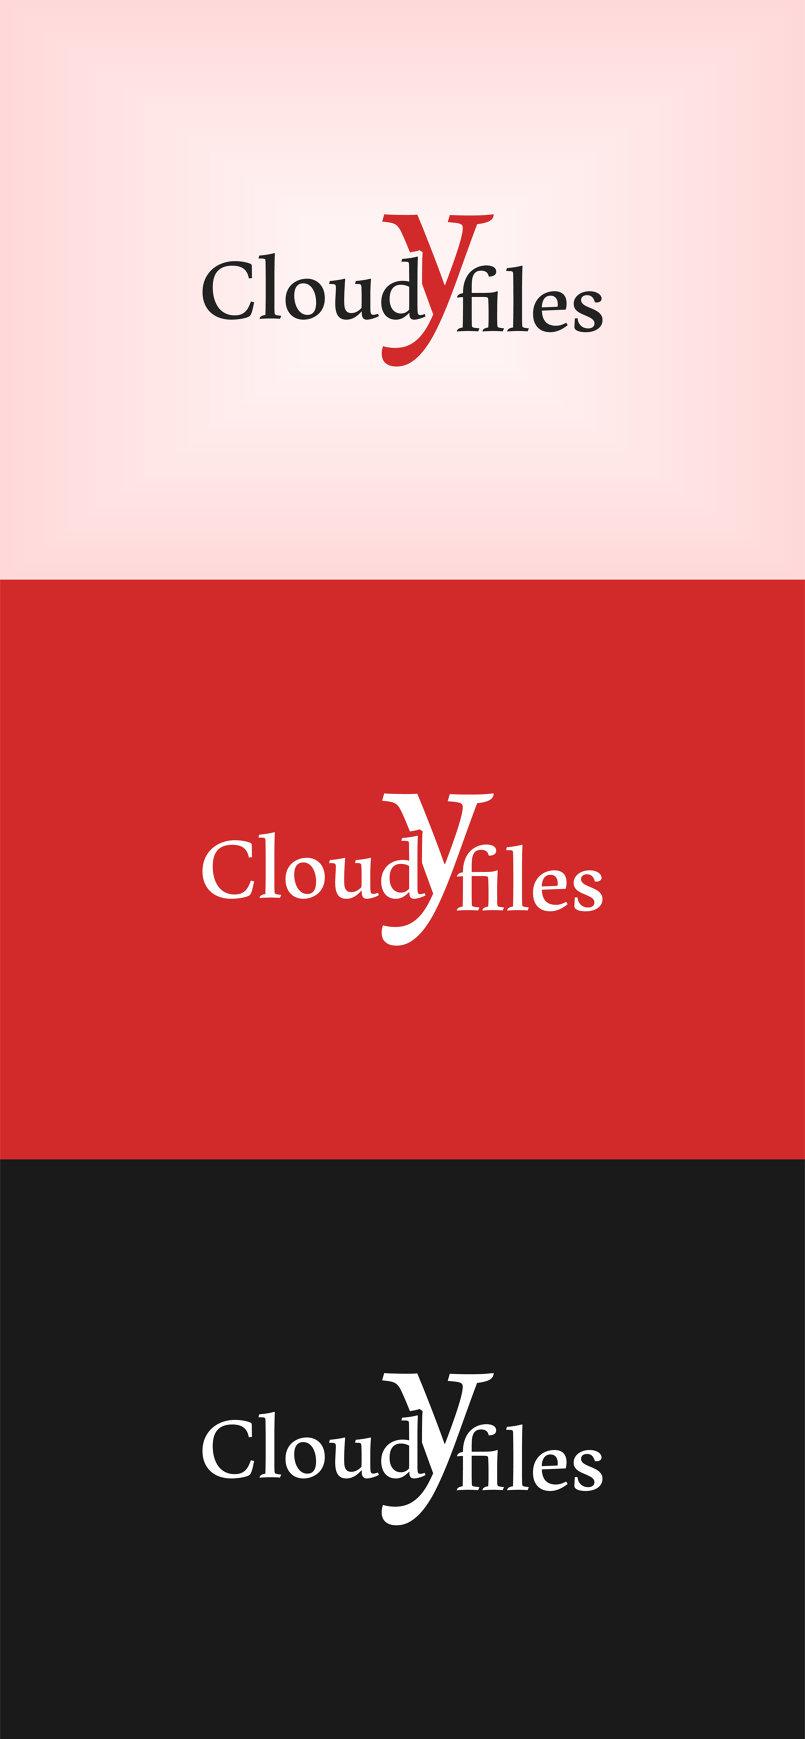 Cloudy files logo